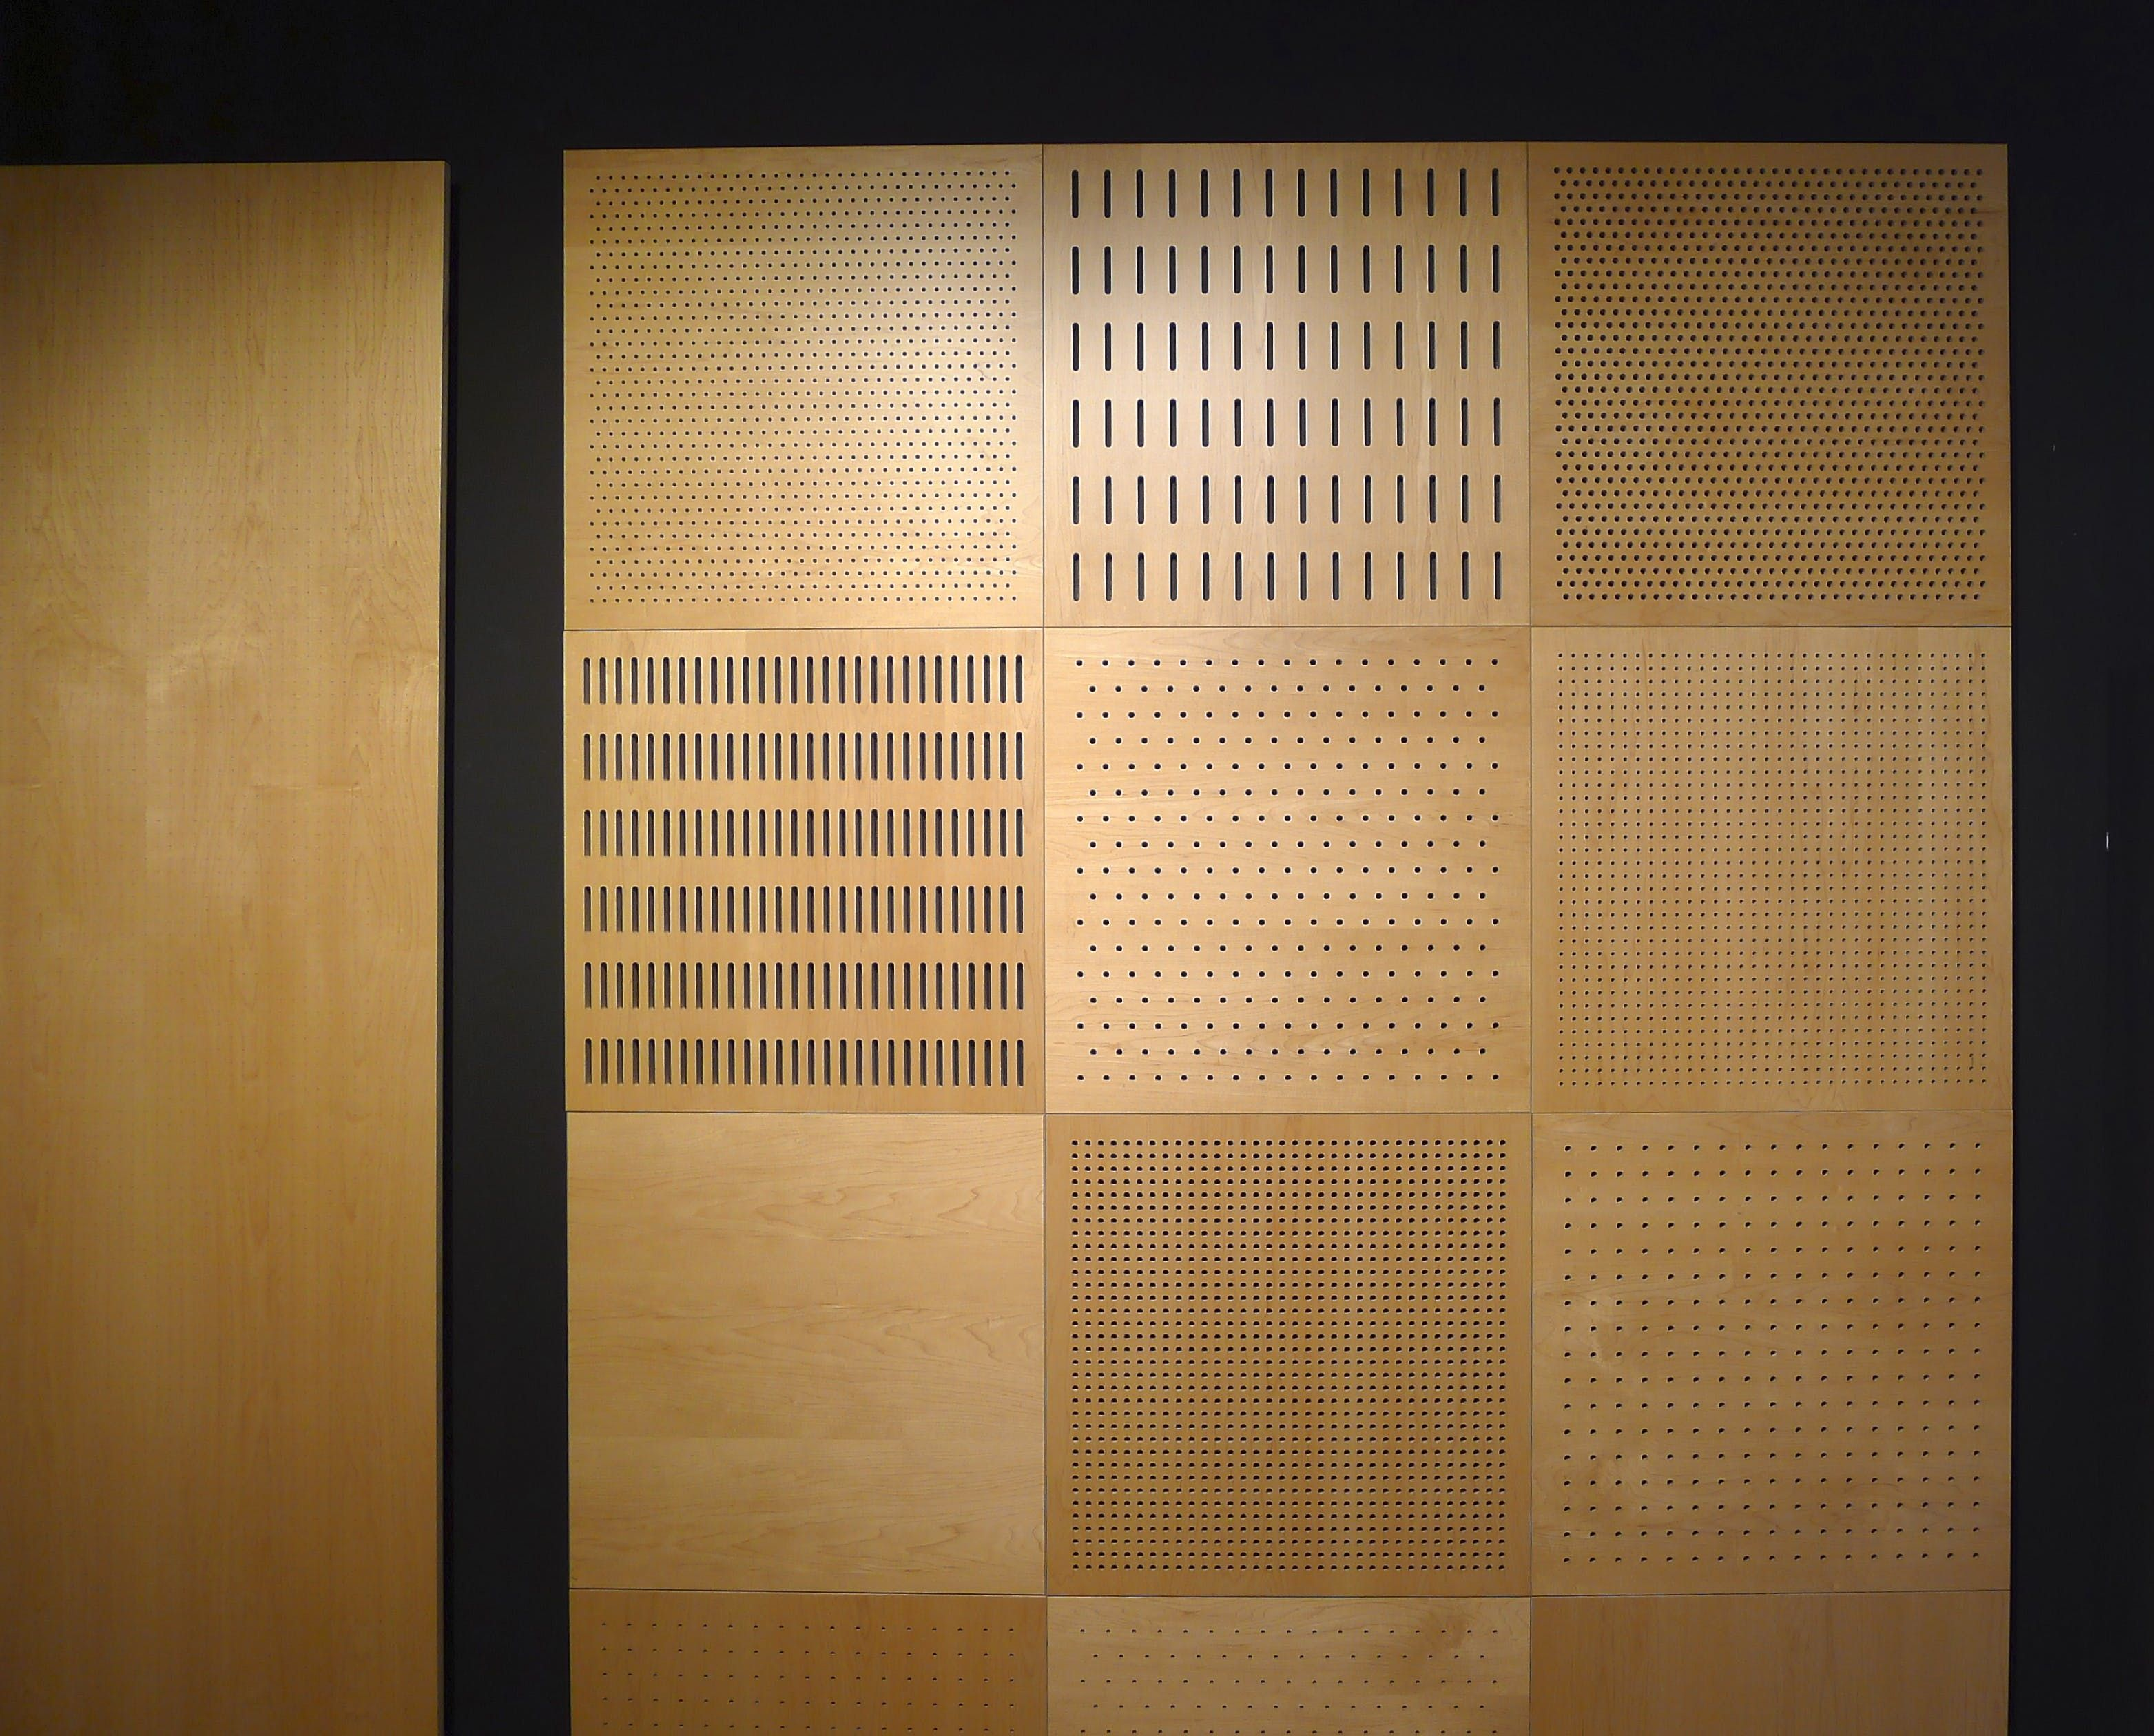 Decustik Perforated Acoustic Panels In Wood By Decustik Acoustic And Decorative Panels Archello Acoustic Wall Panels Acoustic Panels Acoustic Ceiling Tiles